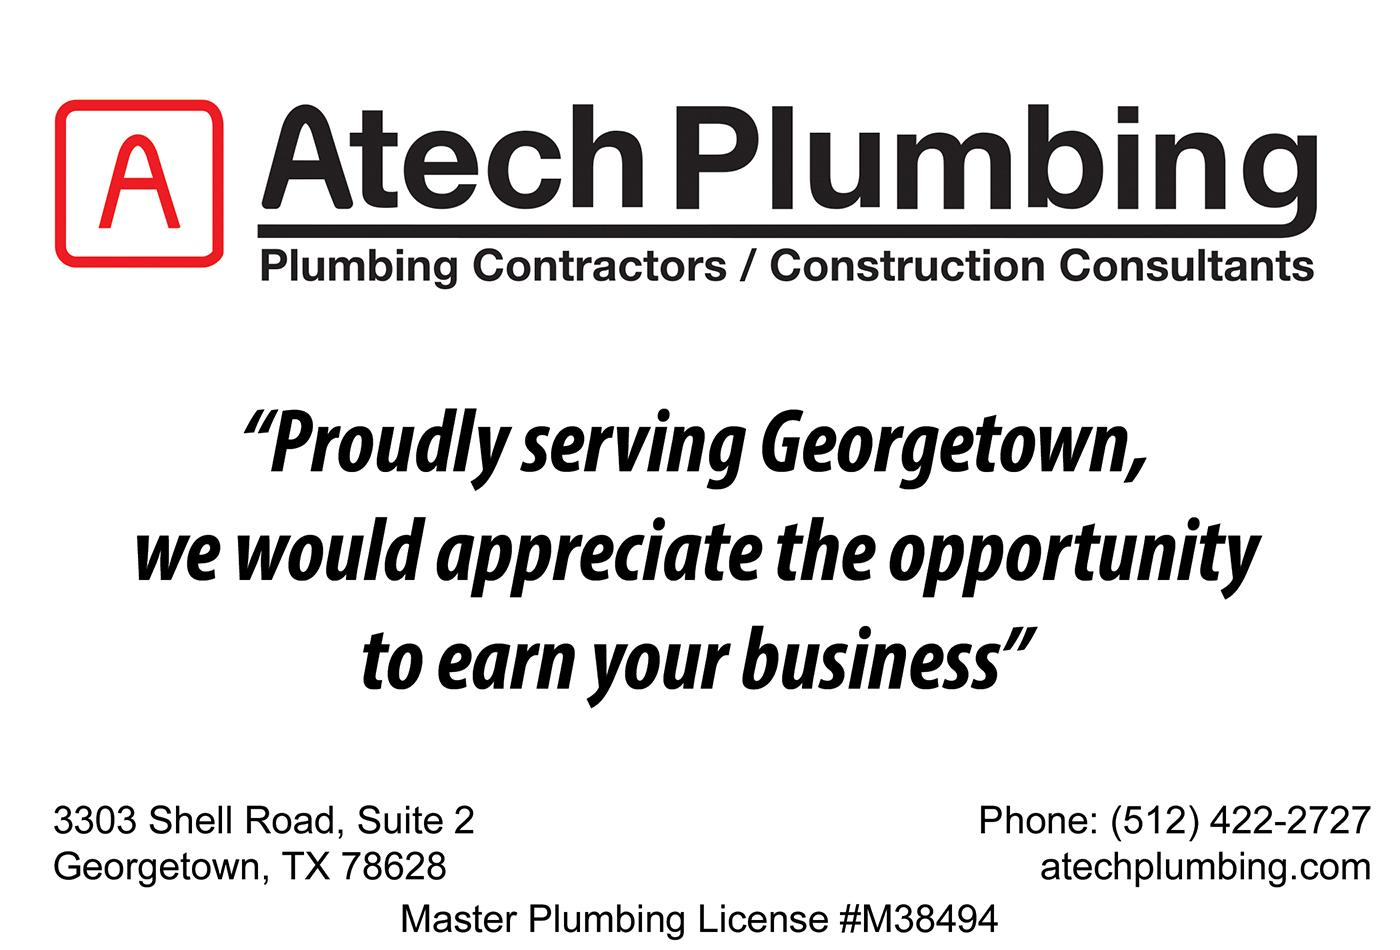 atech-plumbing